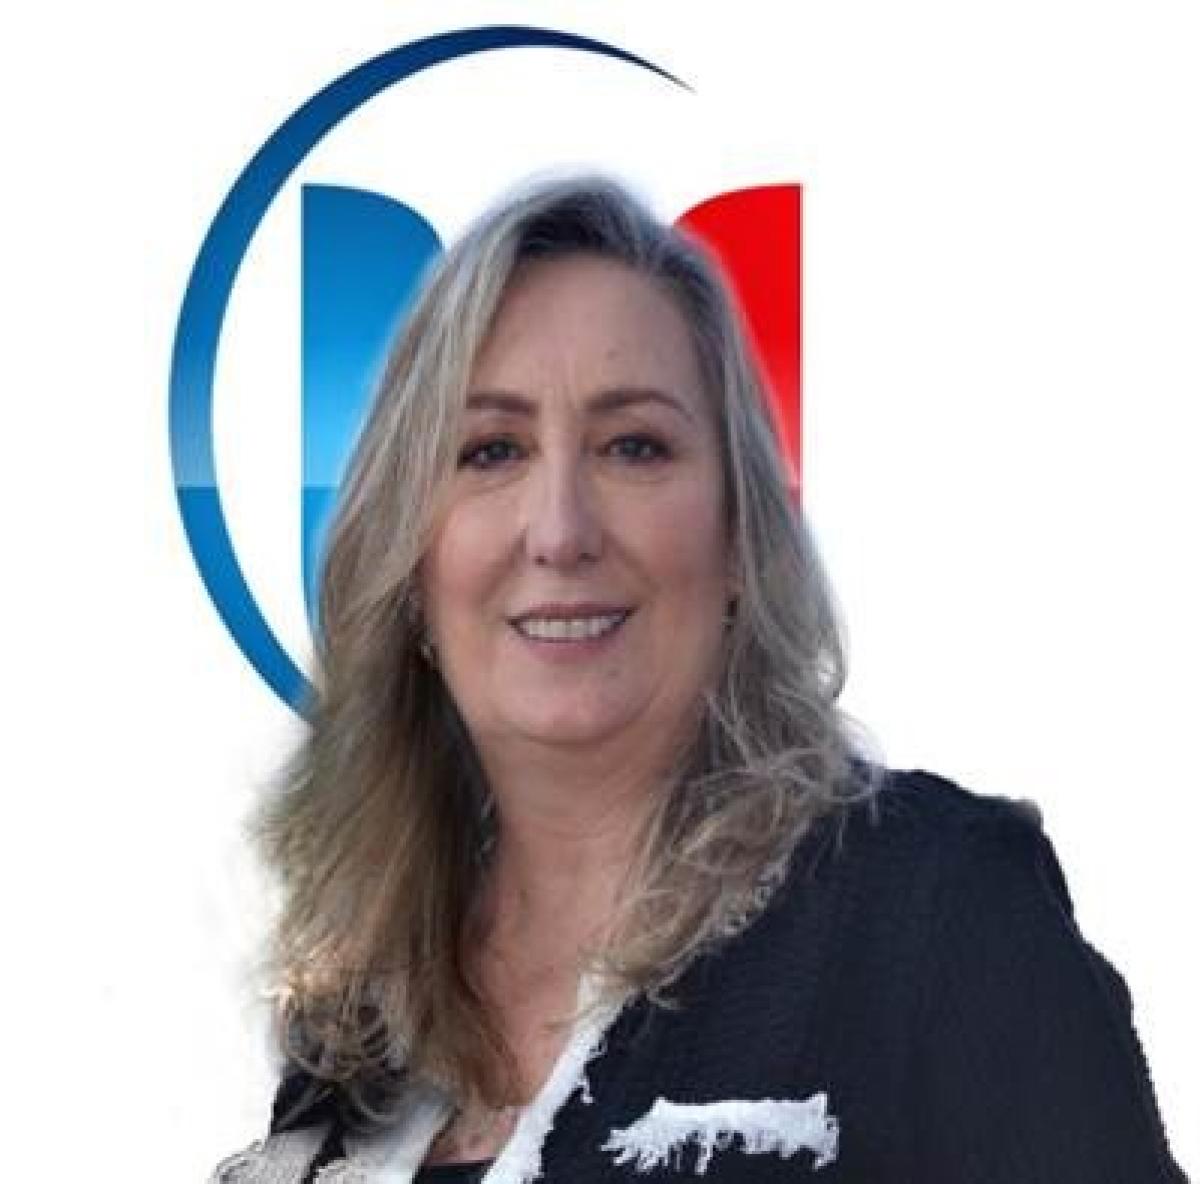 Drª Carla Dolezel